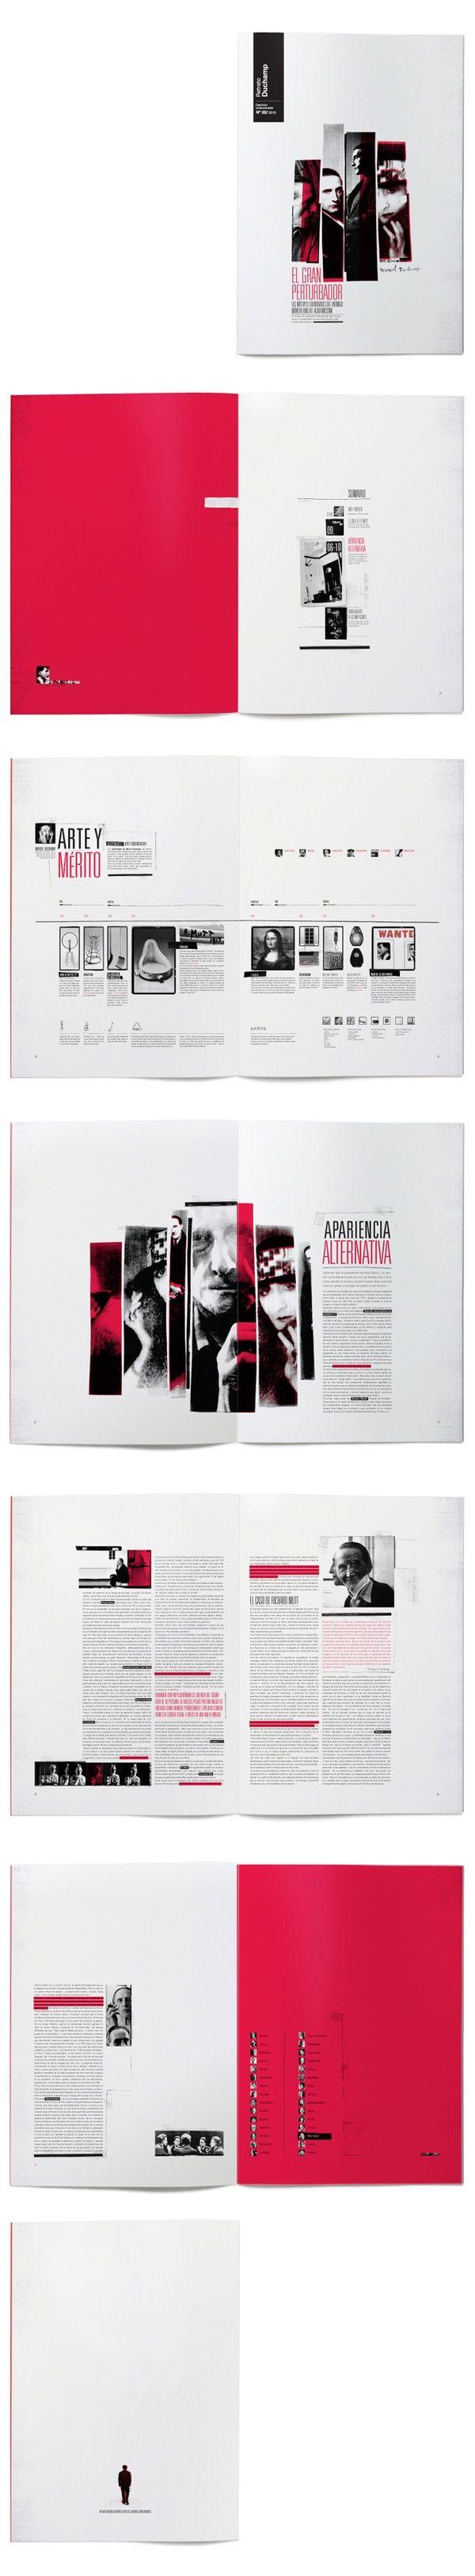 Marcel Duchamp Editorial by Francisco Andriani, via Behance